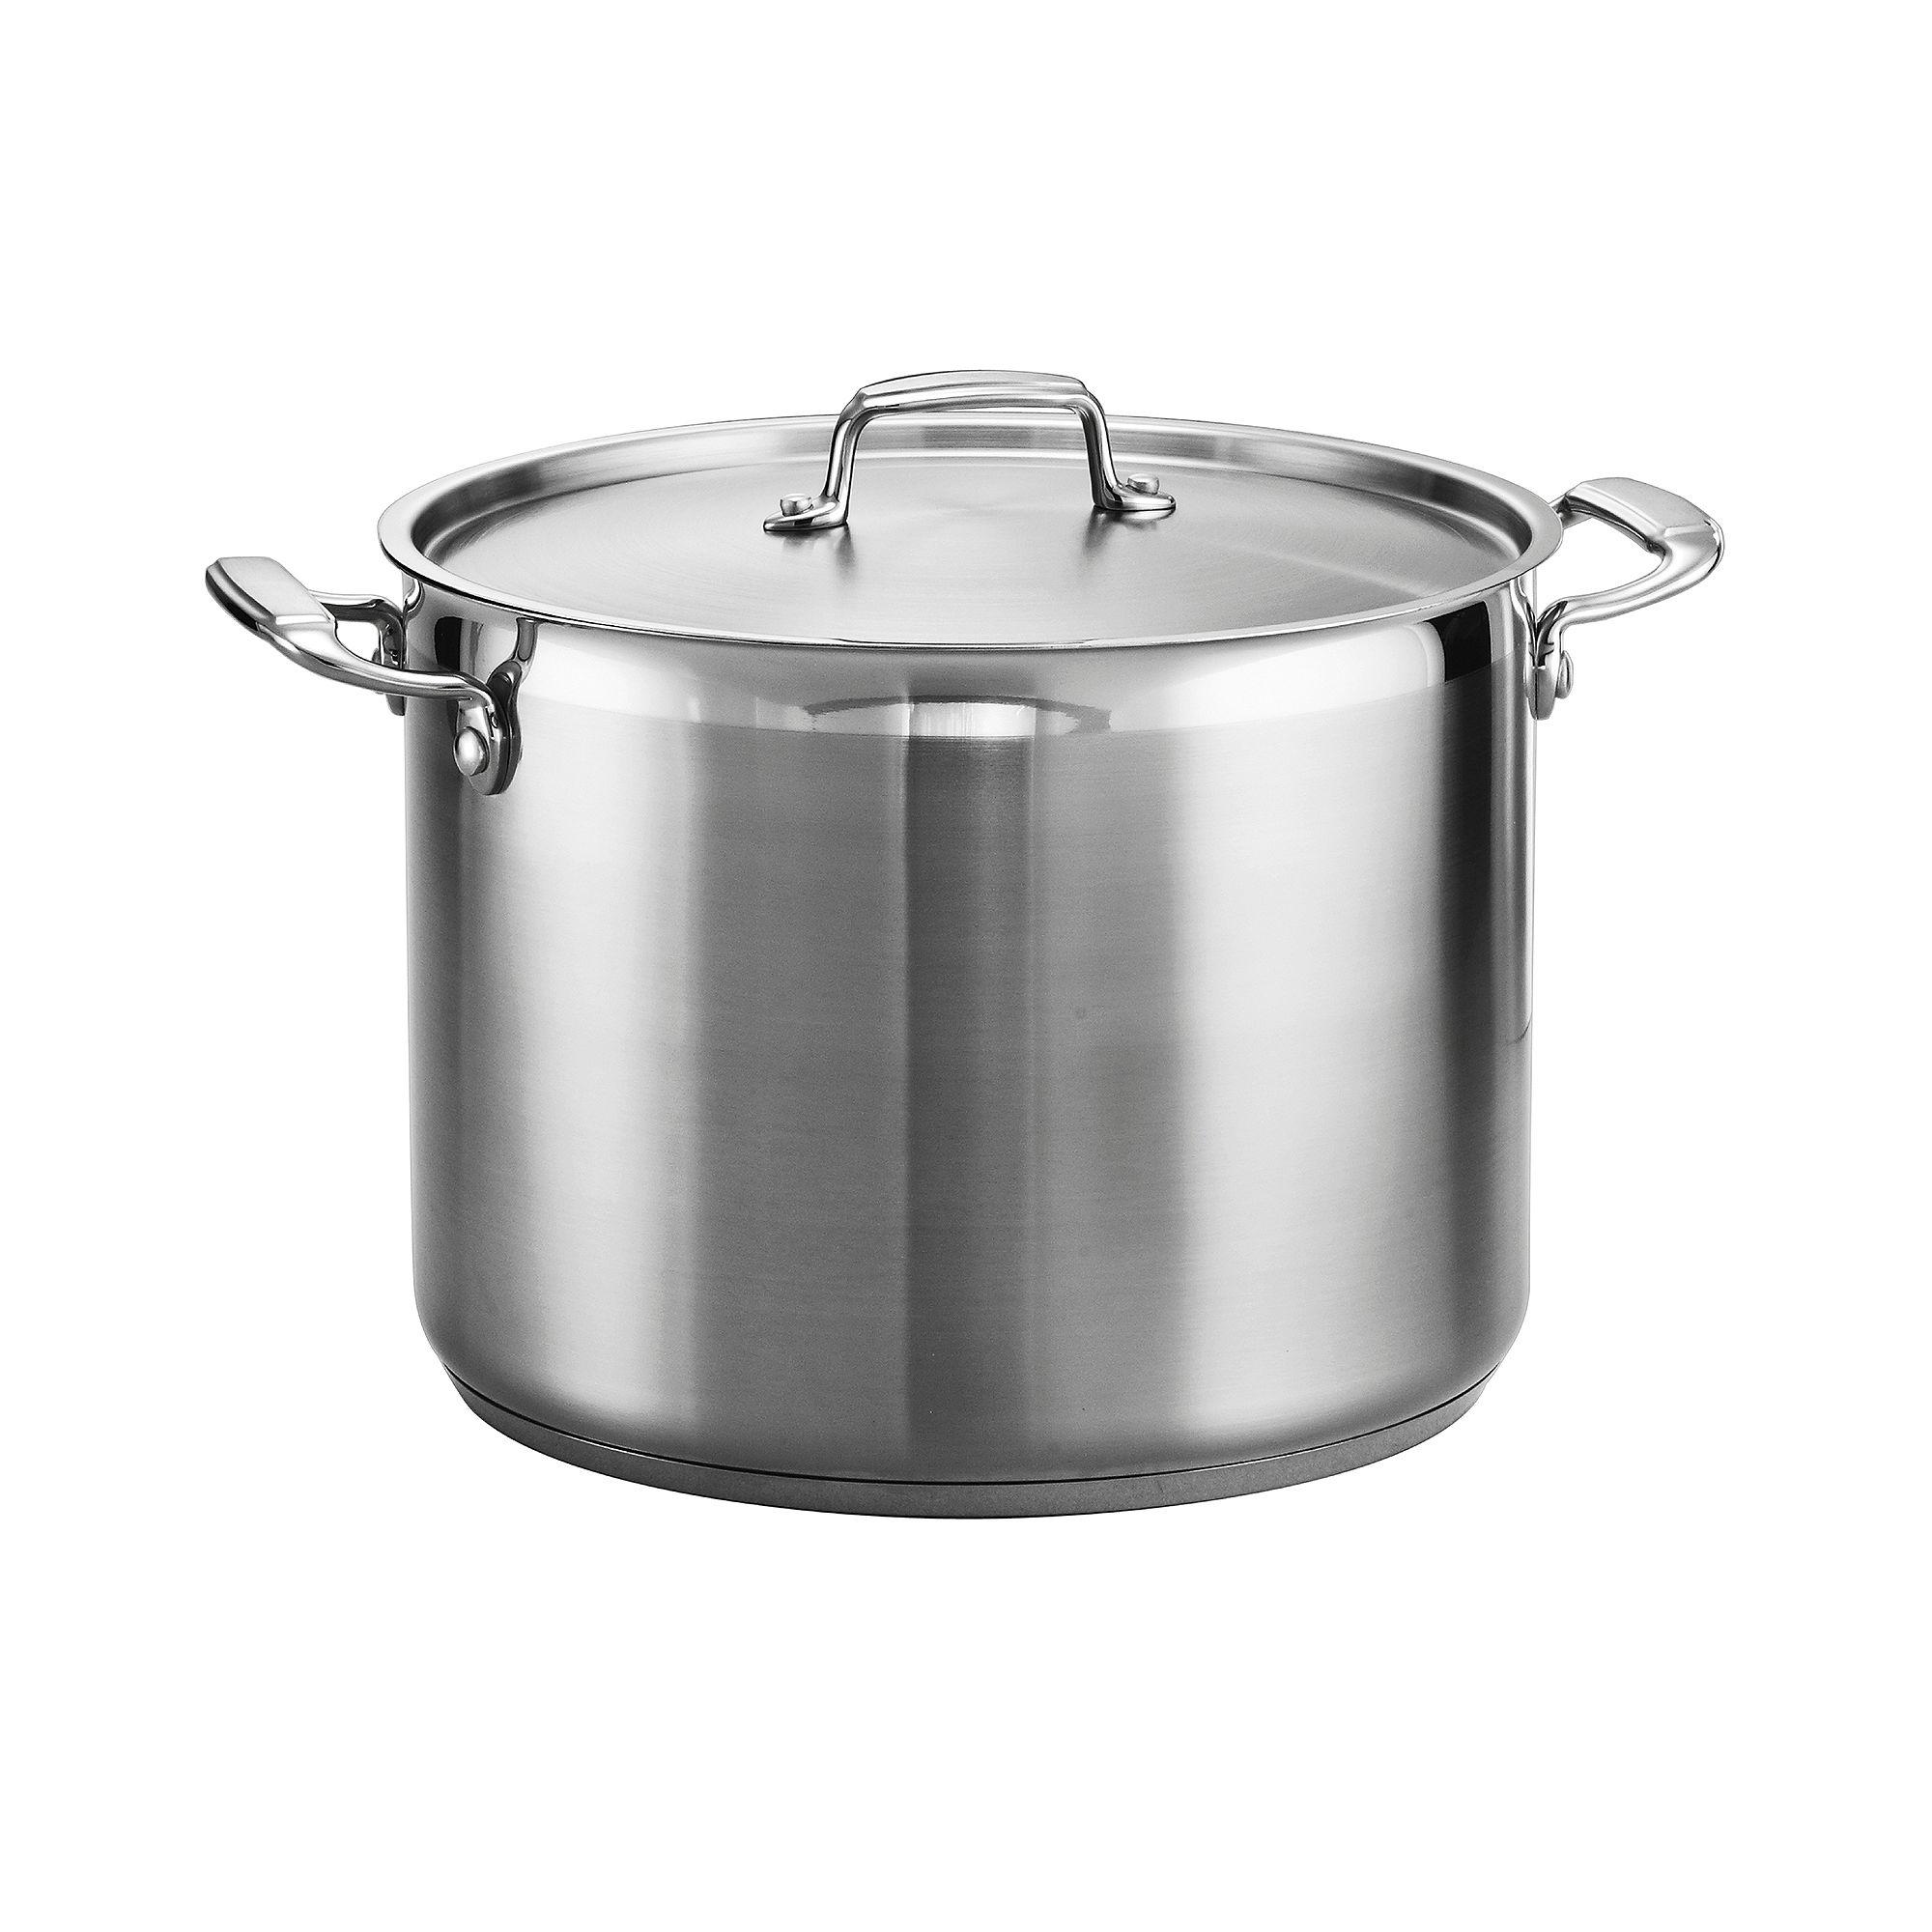 Tramontina Gourmet 16-qt. Tri-Ply Covered Stock Pot